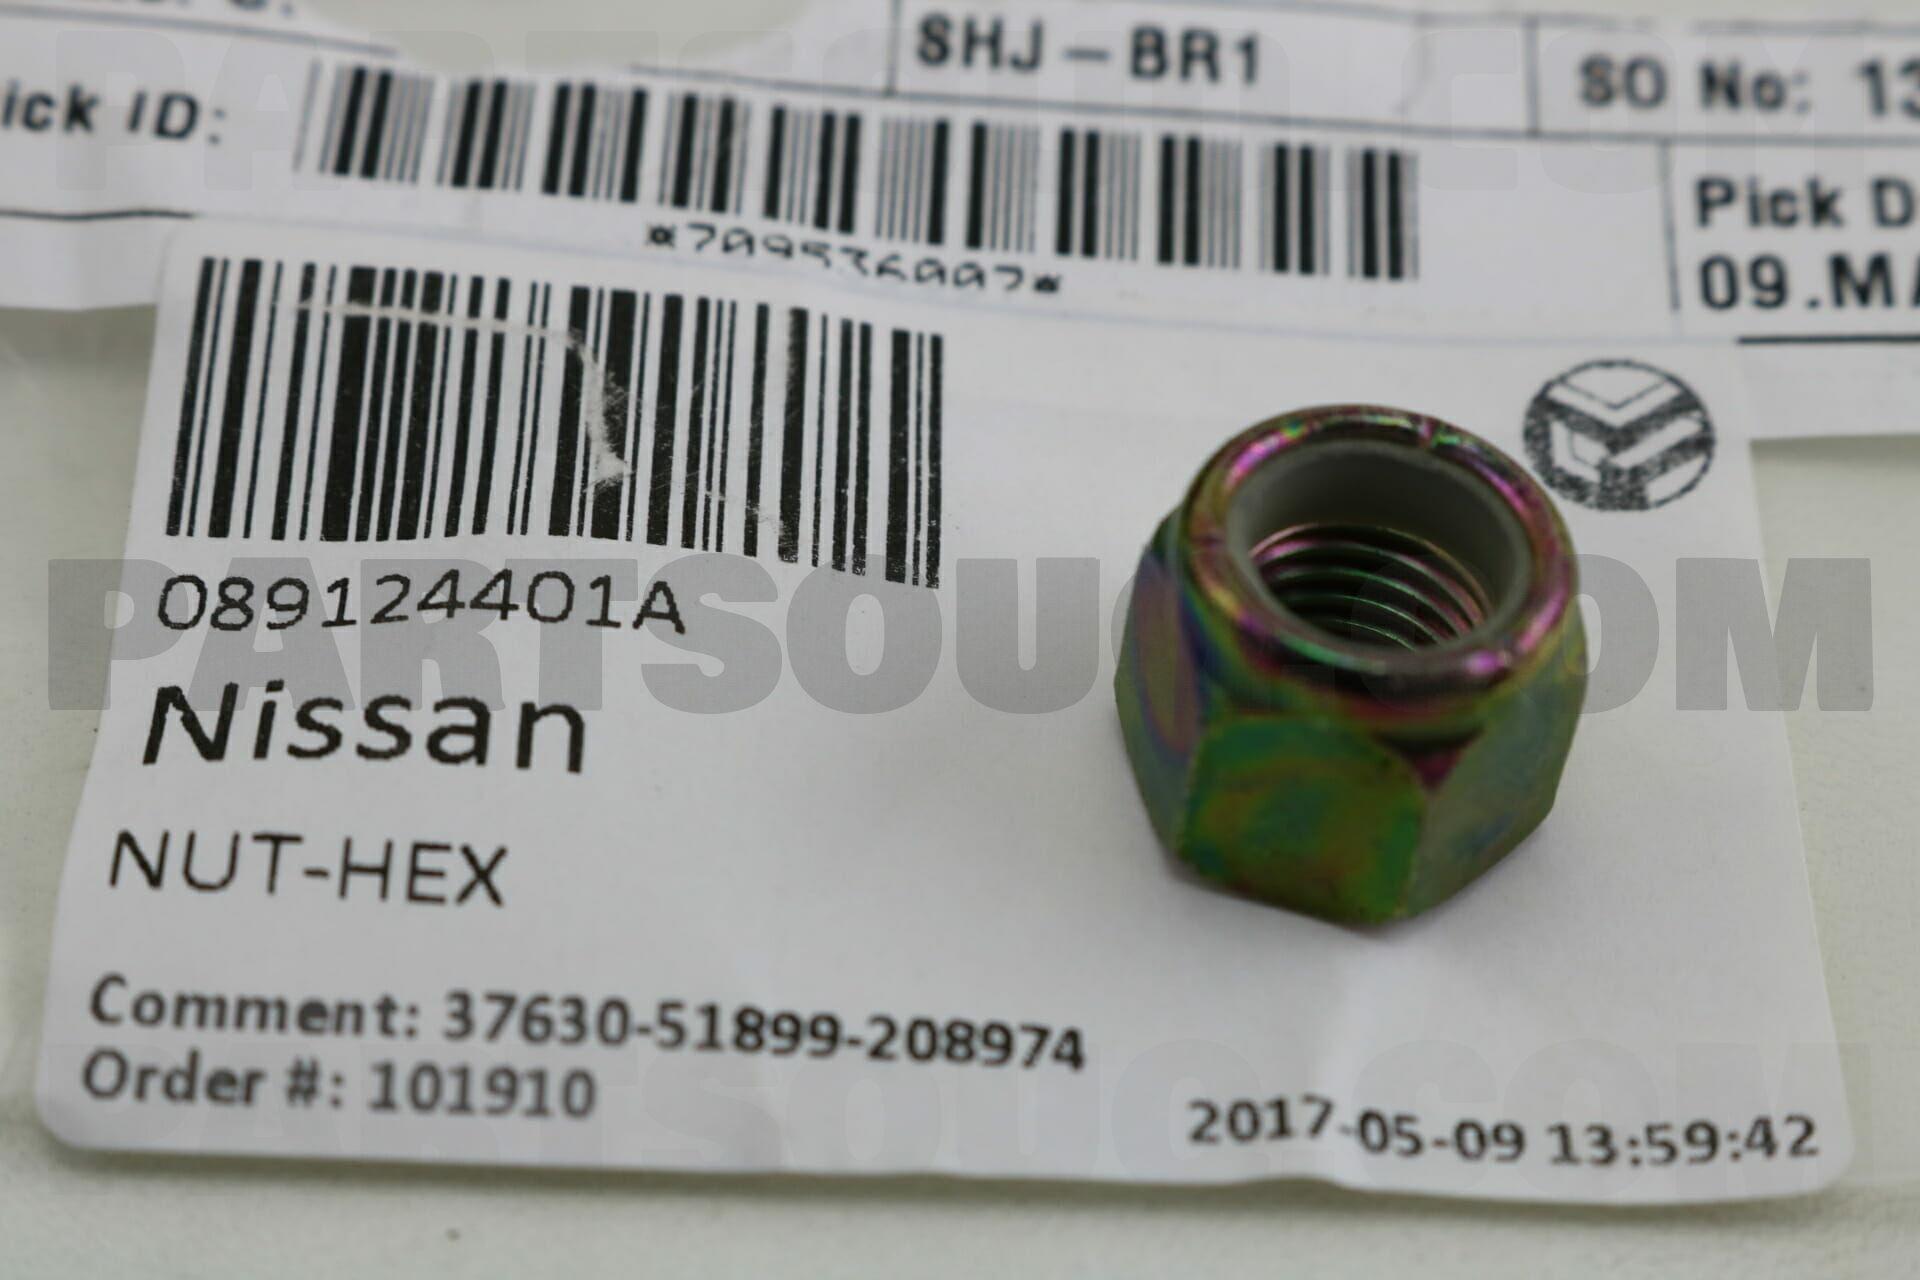 089124401A Nissan NUT-HEX Price: 0 46$, Weight: 0 02kg